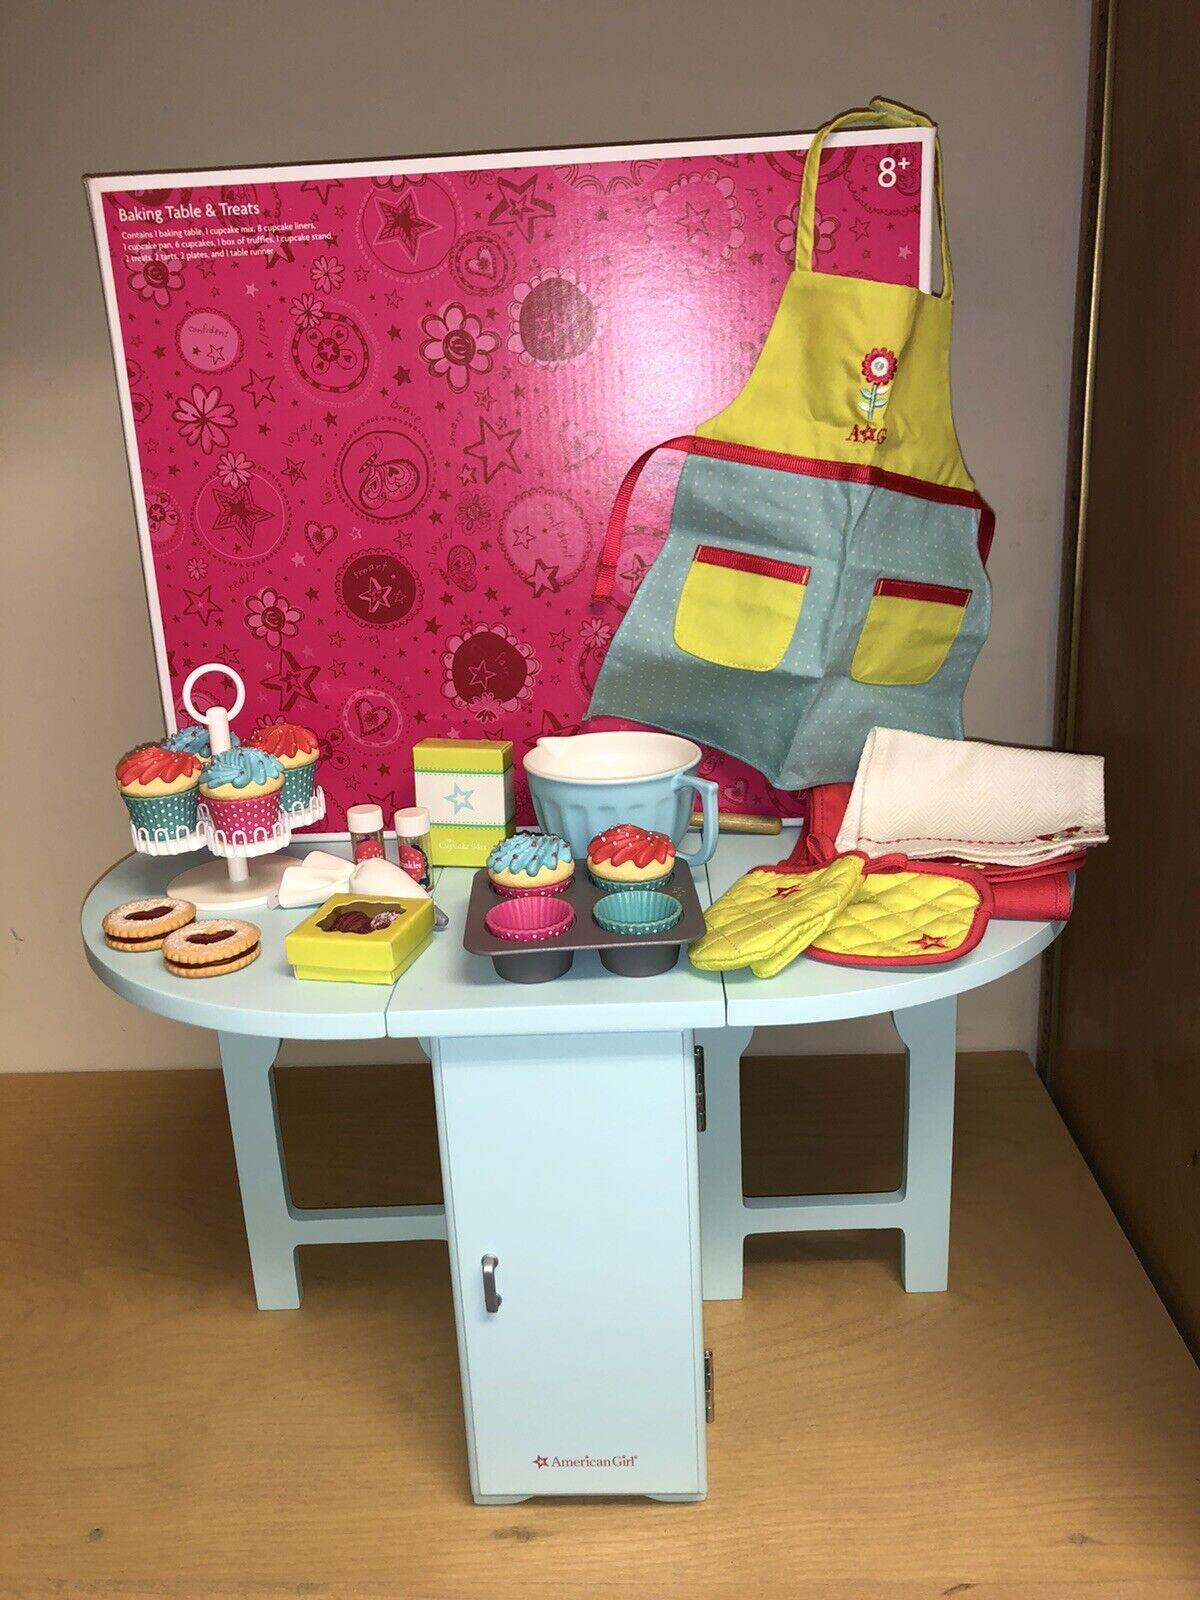 American Girl Doll Baking Table /& Treats Rice Crispy Treats Only